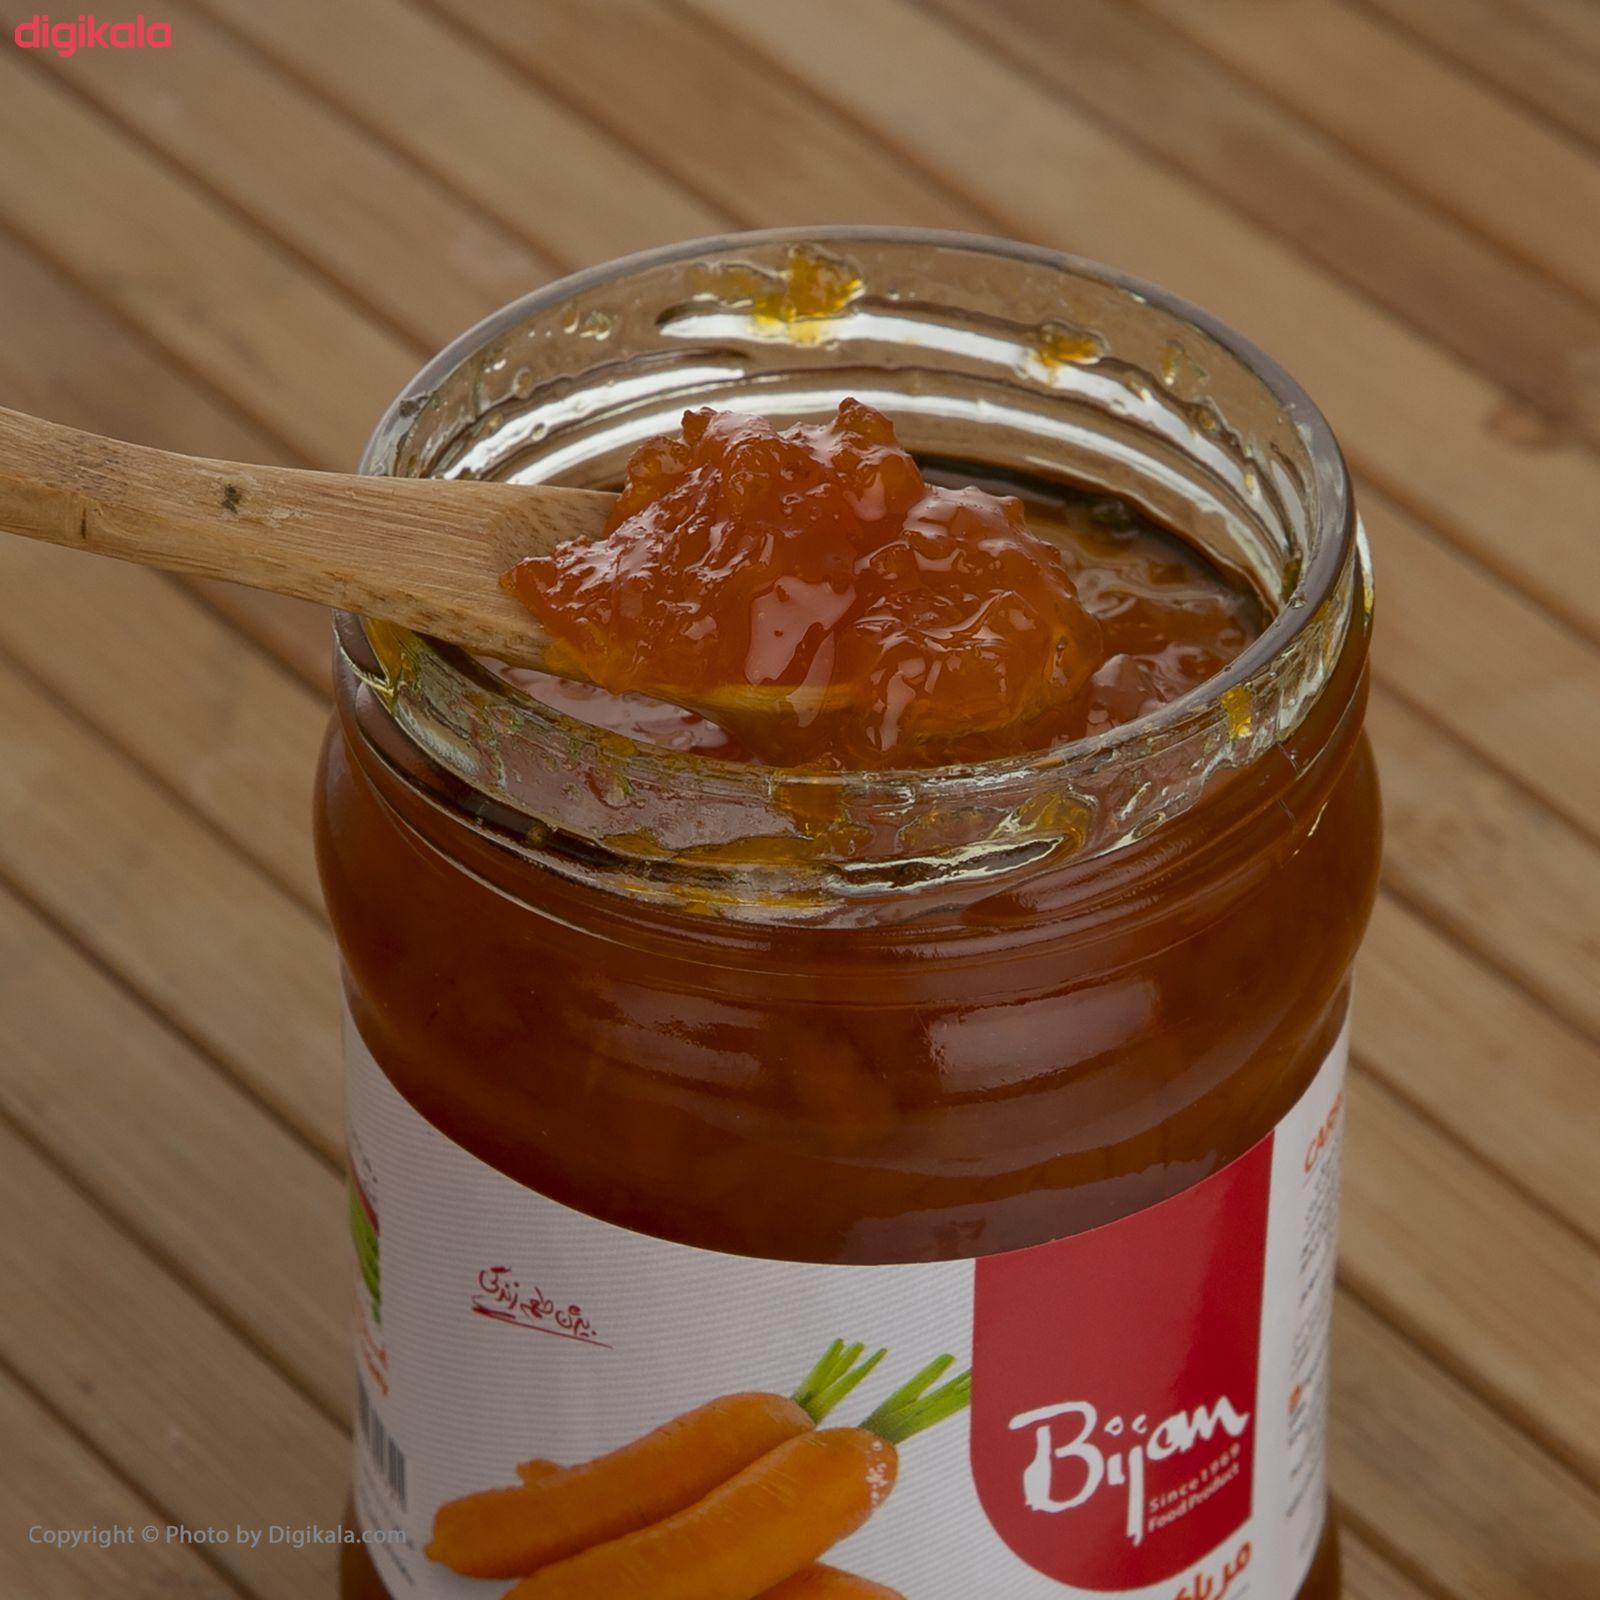 مربا هویج بیژن - 290 گرم main 1 2